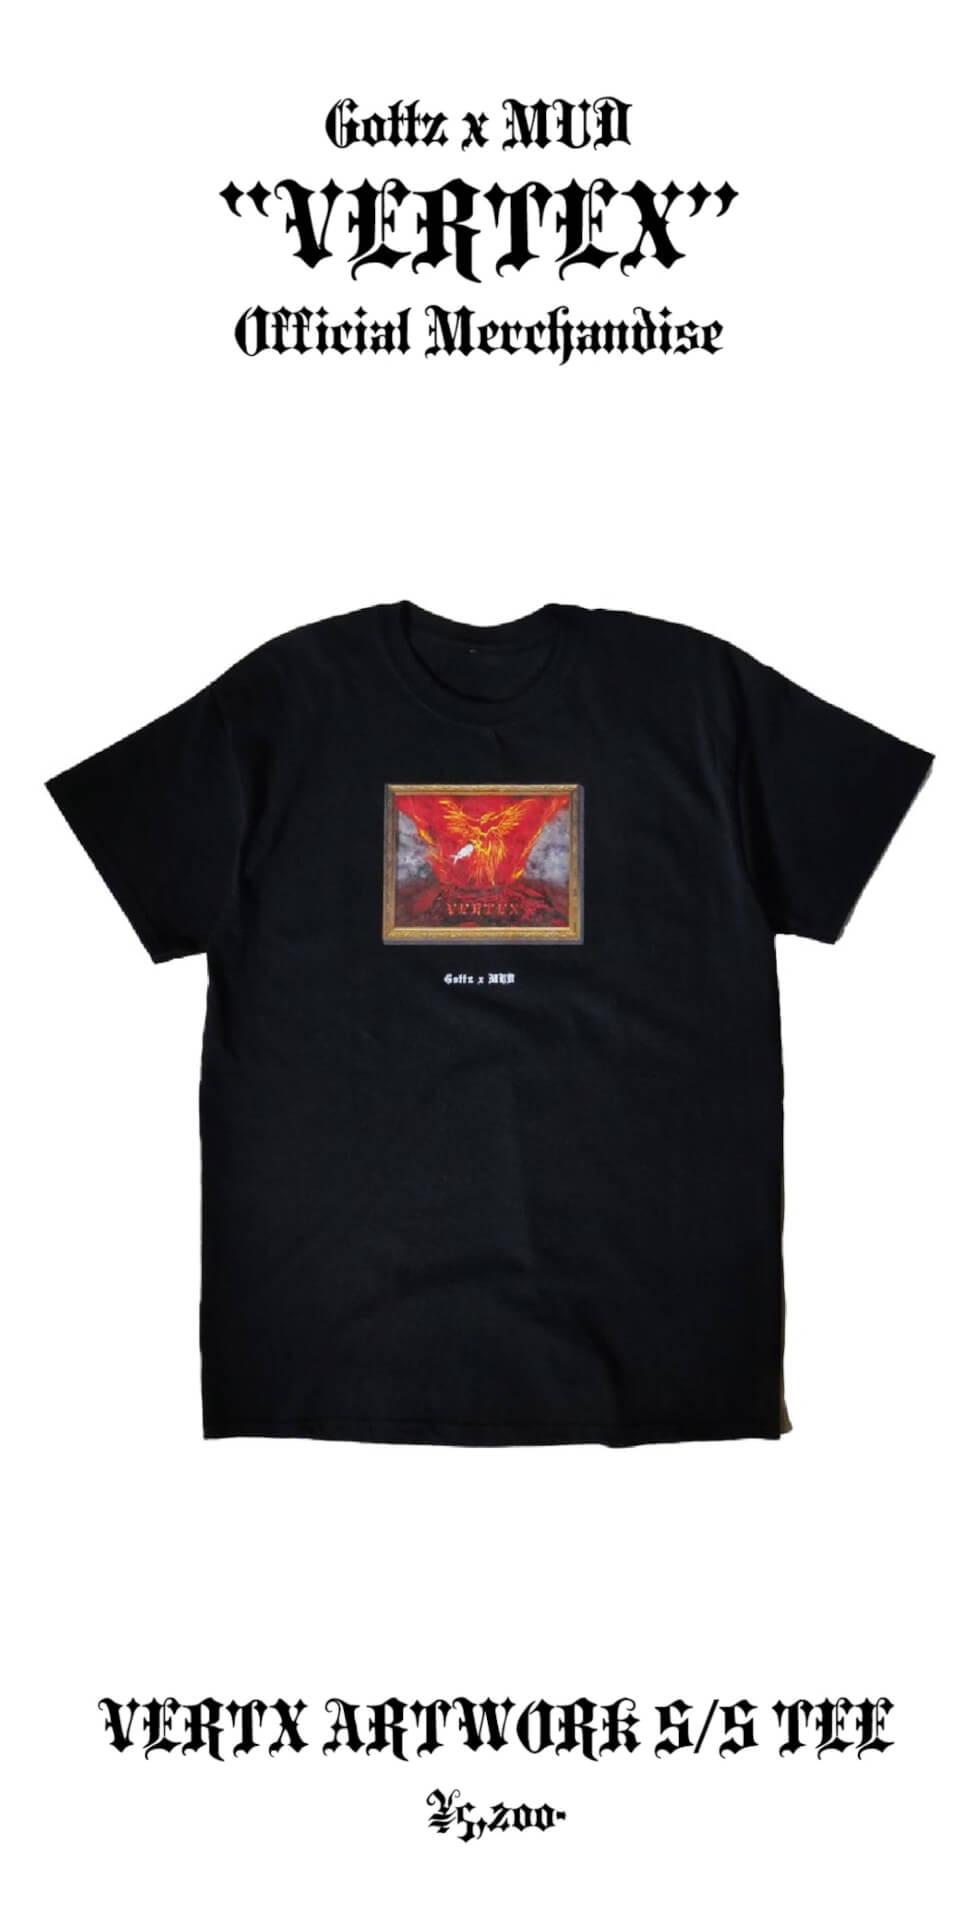 "KANDYTOWNのGottz & MUDによる1stアルバム『VERTEX』がリリース|配信ライブ開催&""Adrenalin""も解禁 music200710_gottz_mud_1"